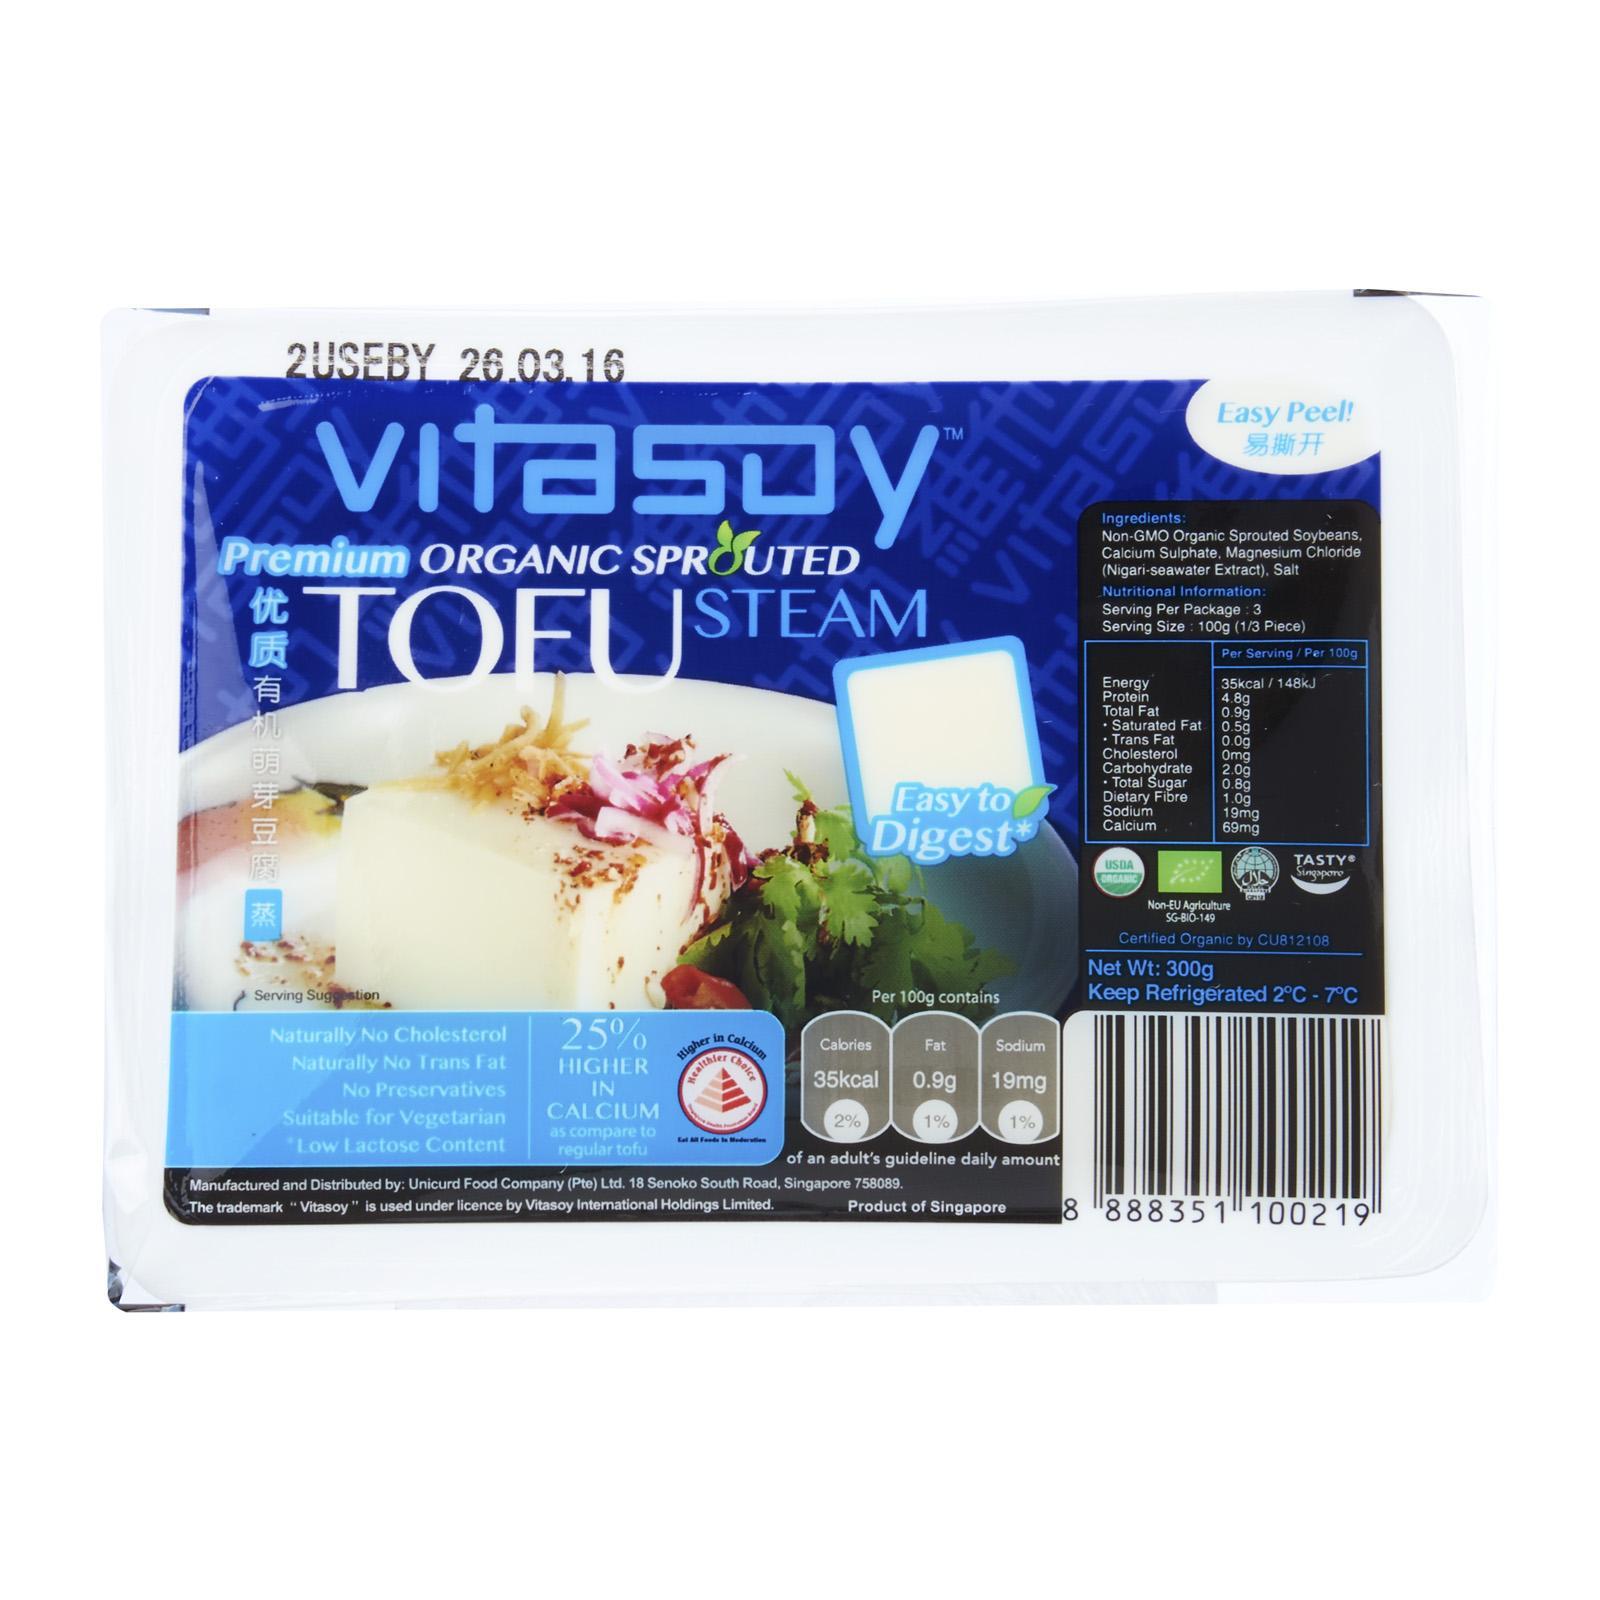 Vitasoy Premium Organic Sprouted Tofu - Steam